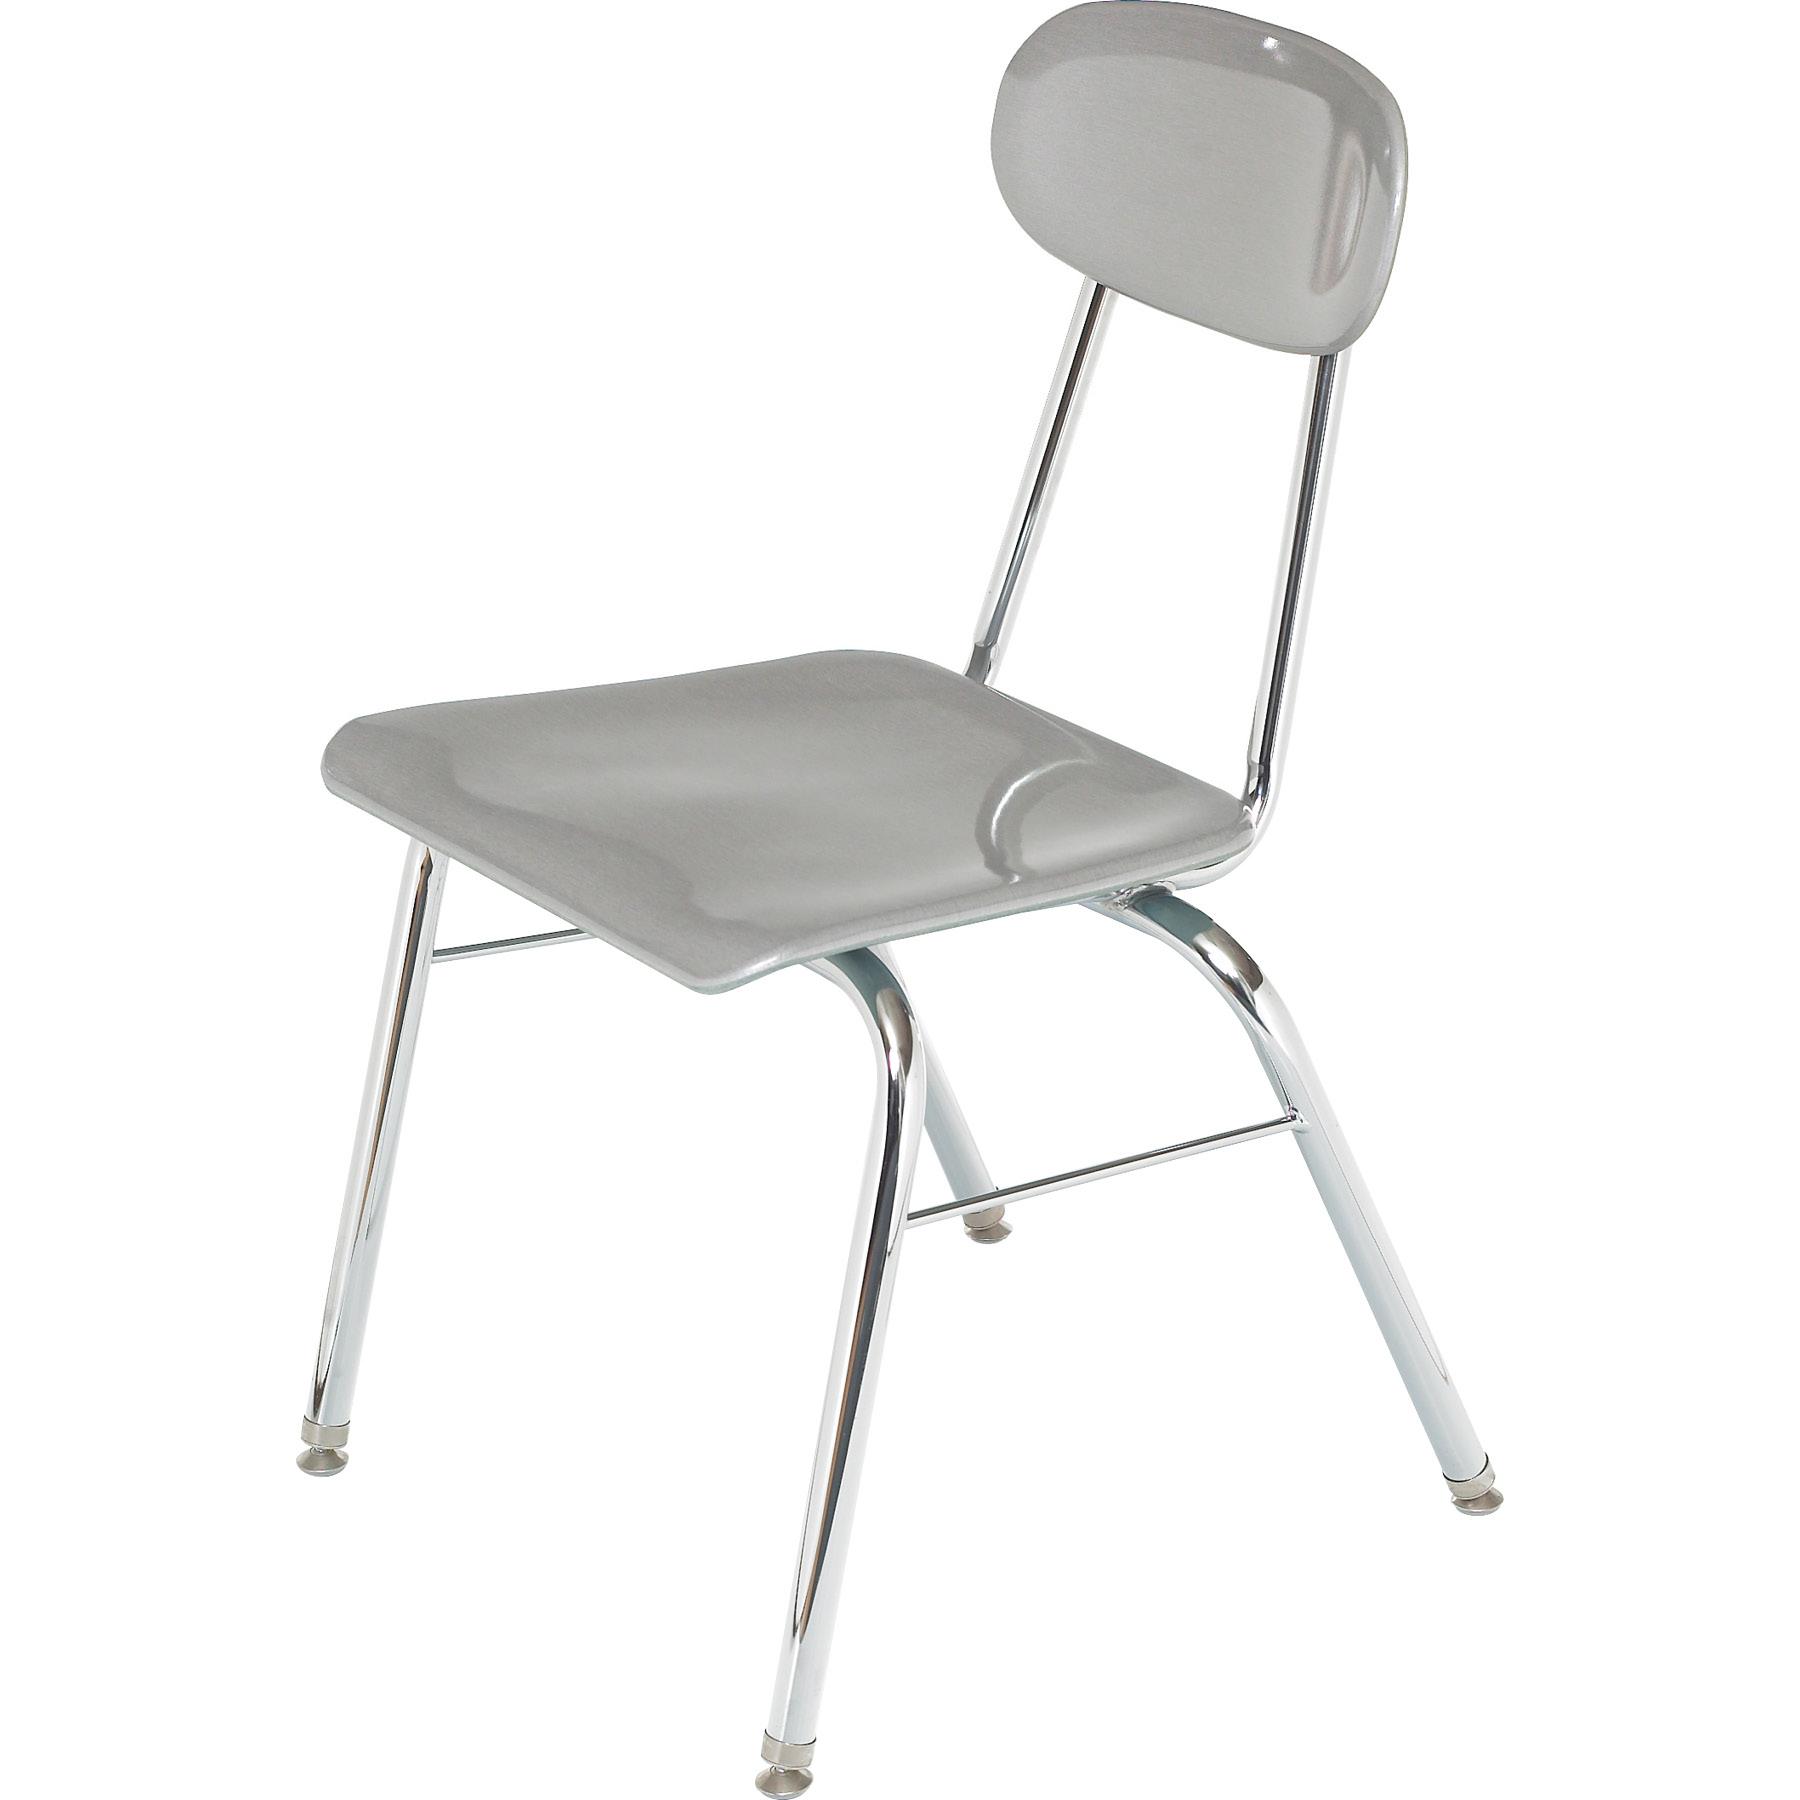 114 Super Stacker Chair